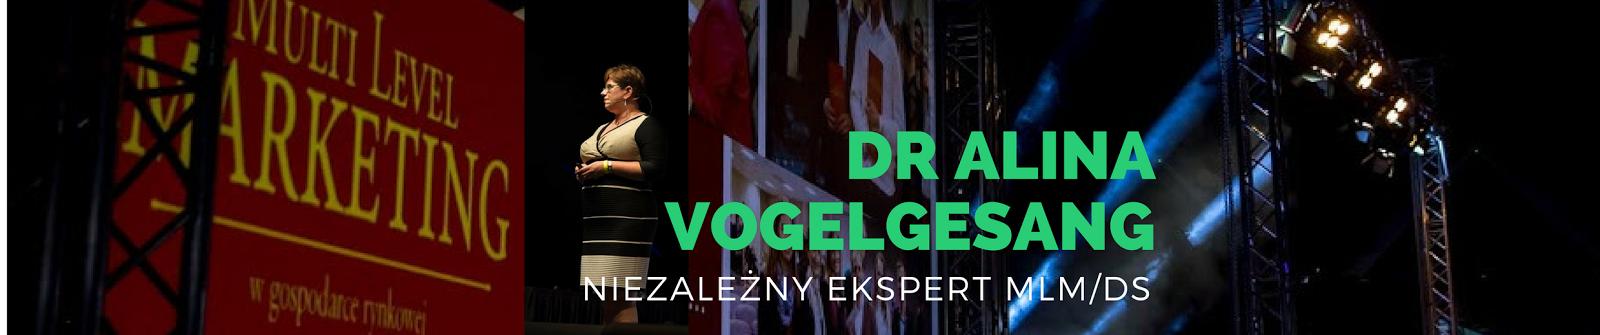 dr Alina Vogelgesang o MLM i nie tylko....